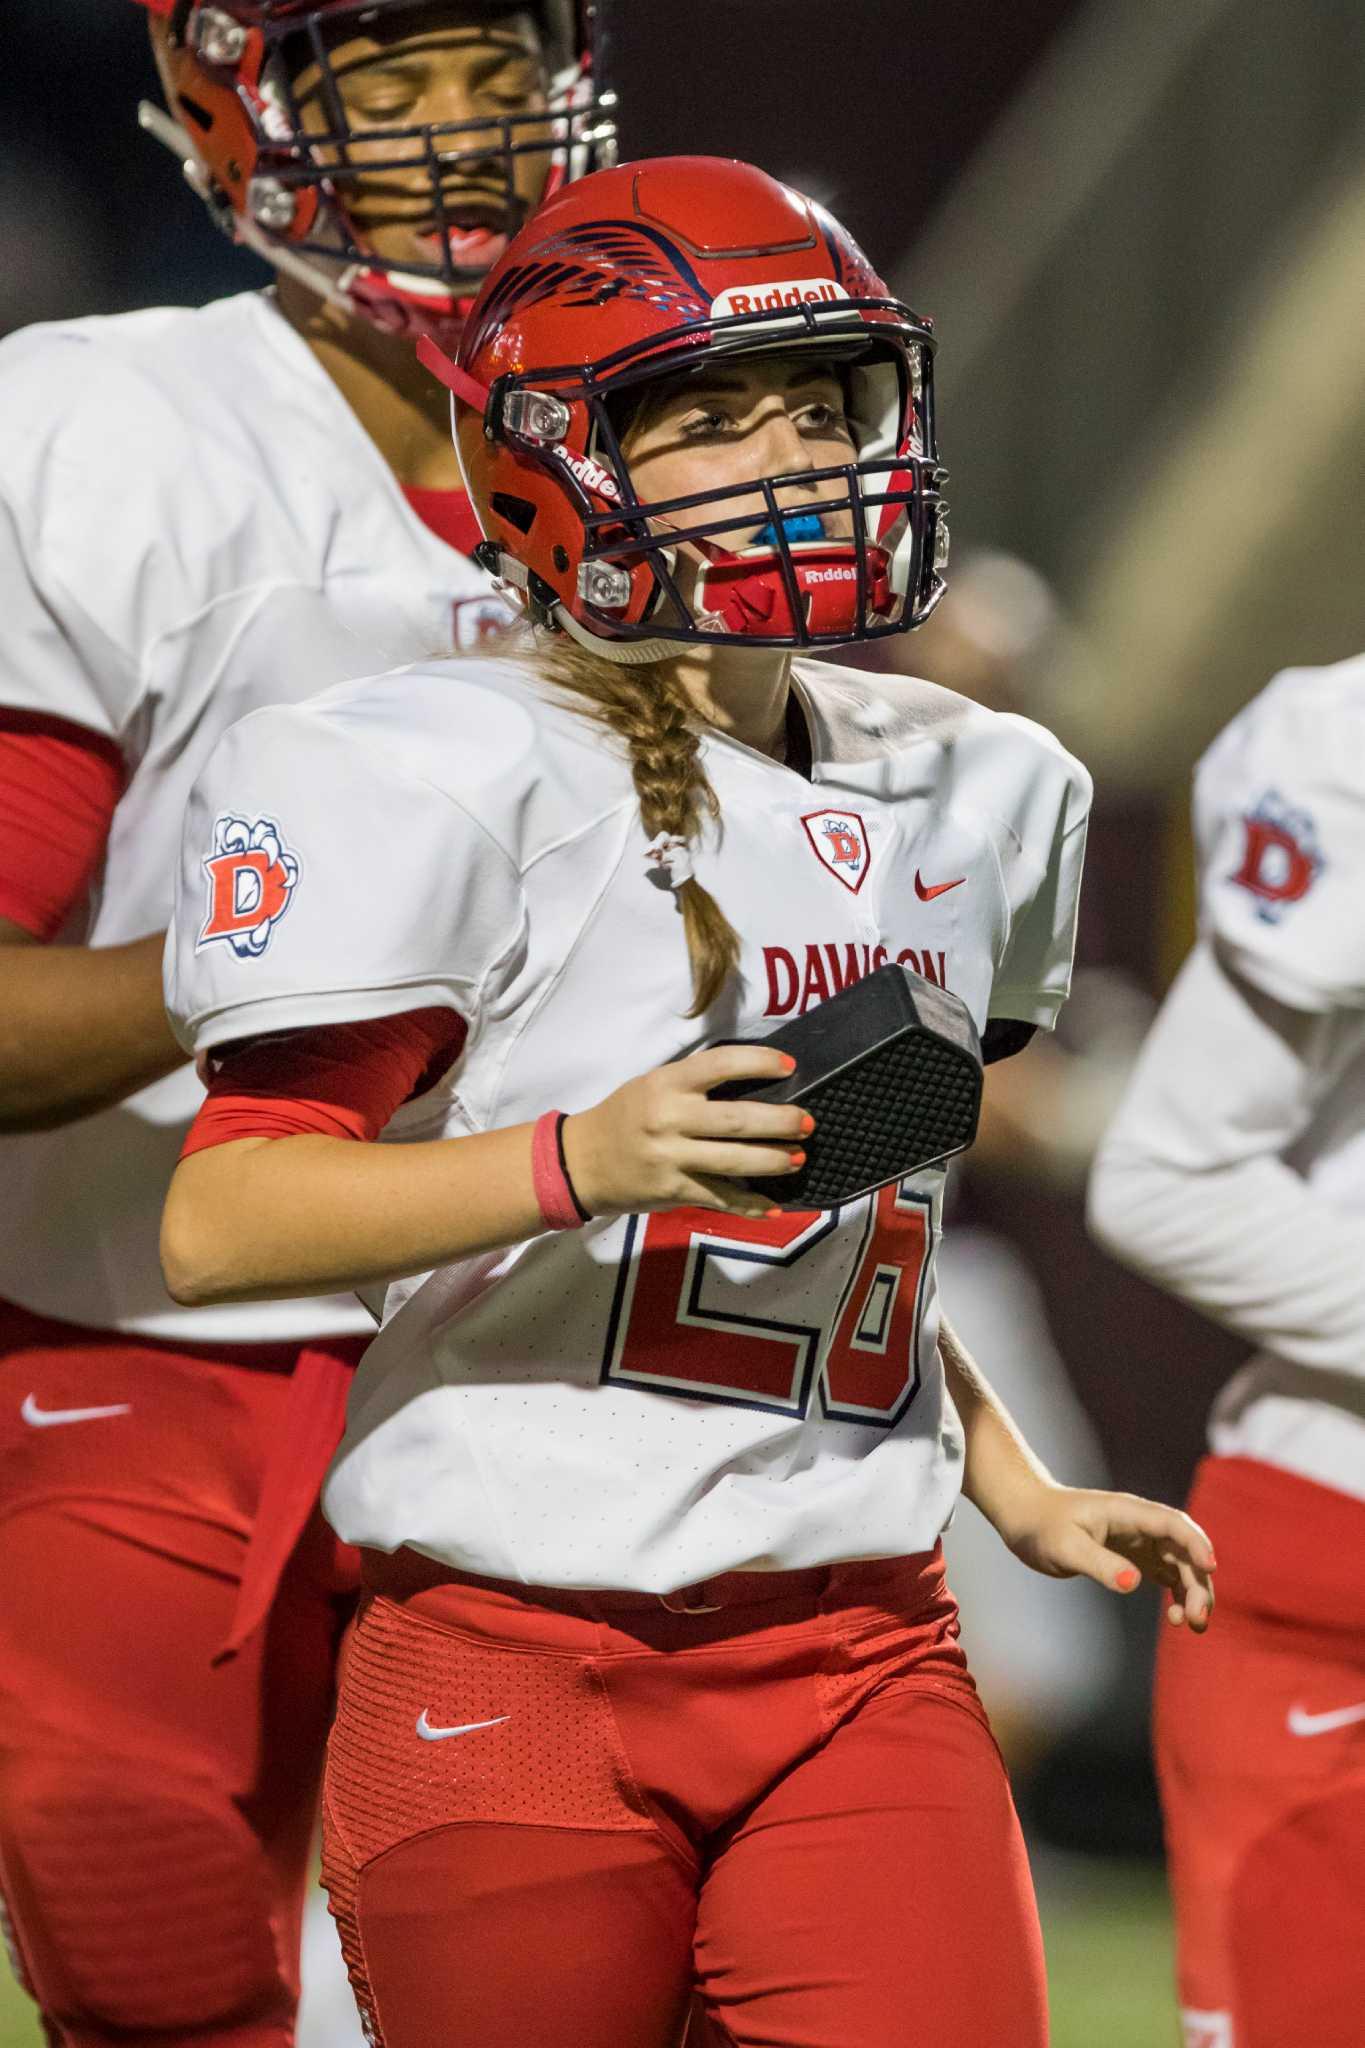 29e5317185b Female kicker finds footing at Dawson - Houston Chronicle